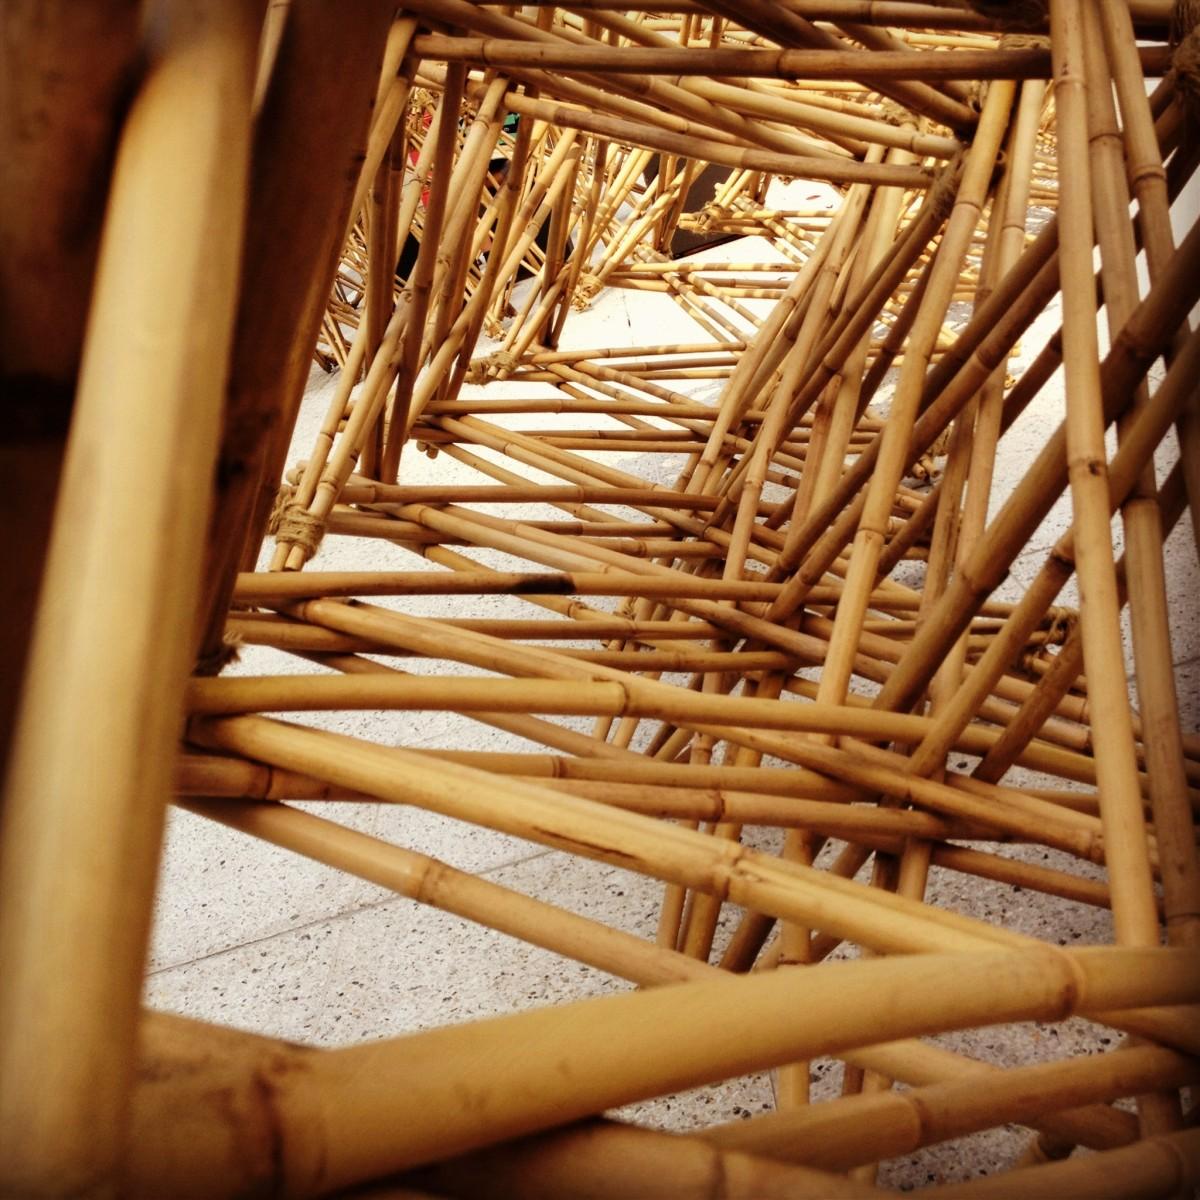 Gambar : Alam, Struktur, Kayu, Tekstur, Kursi, Konstruksi